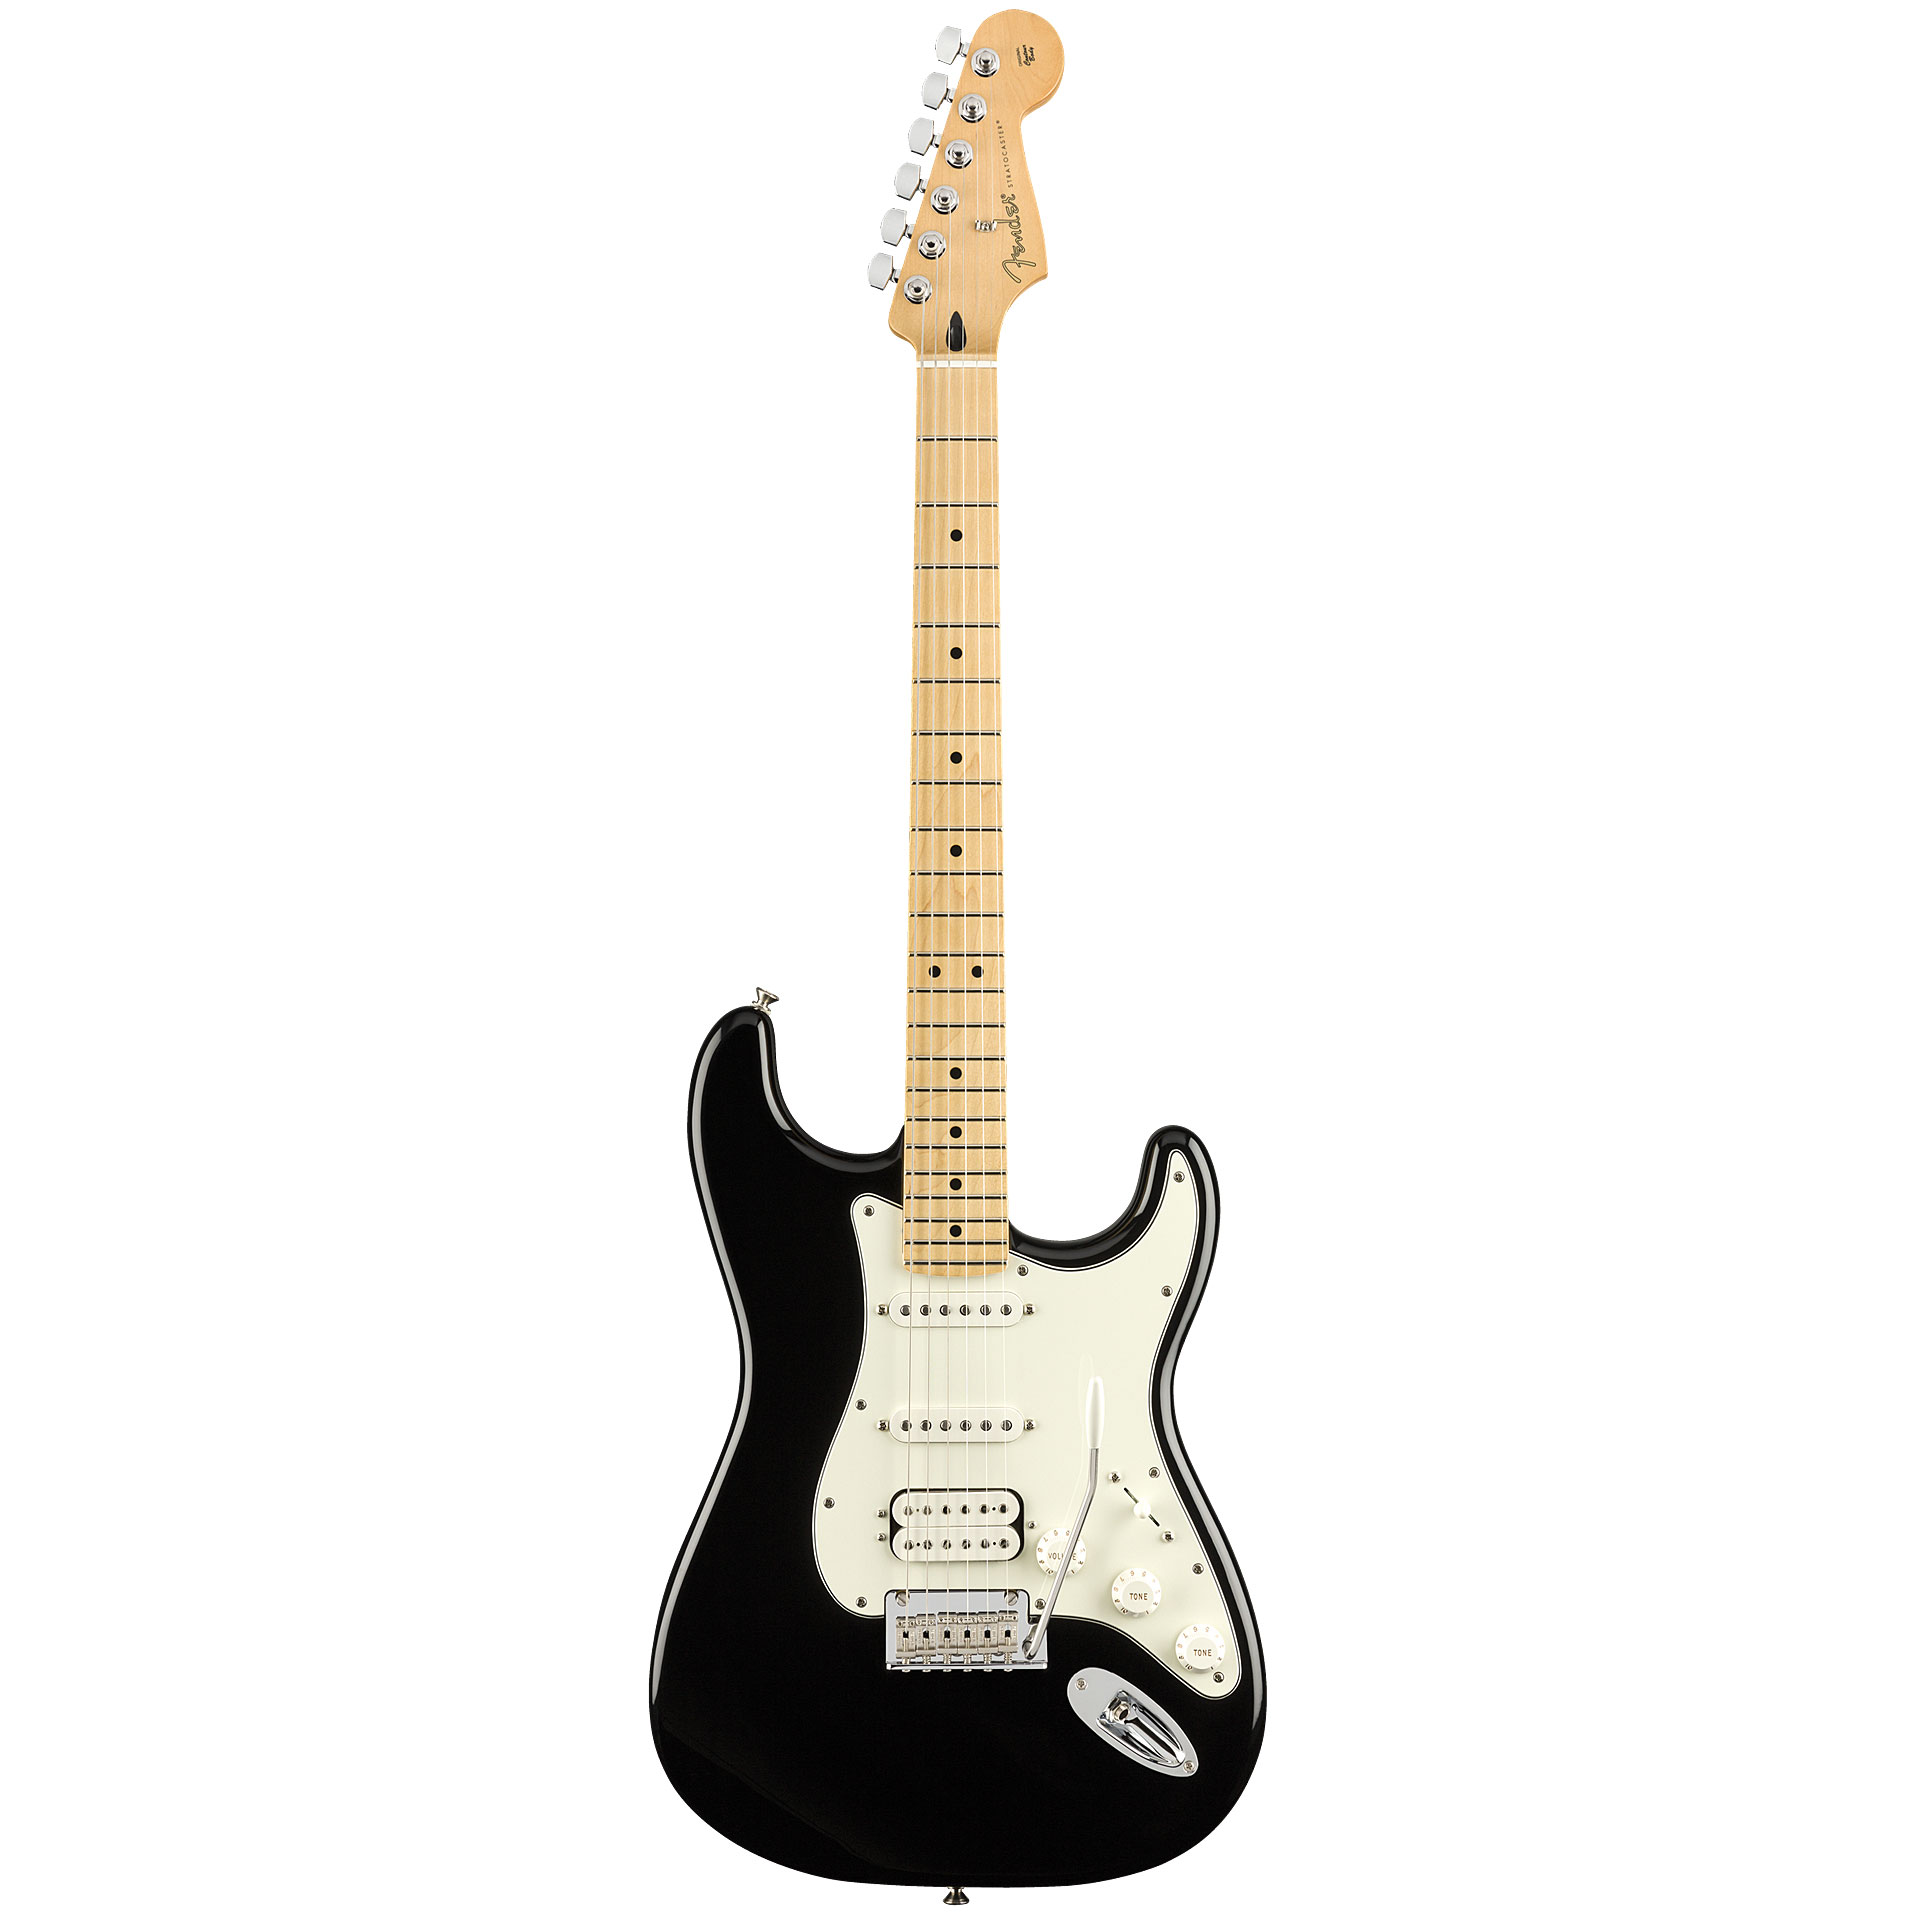 Fender PLAYER SERIES STRAT HSS MN BLK elektrinė gitara